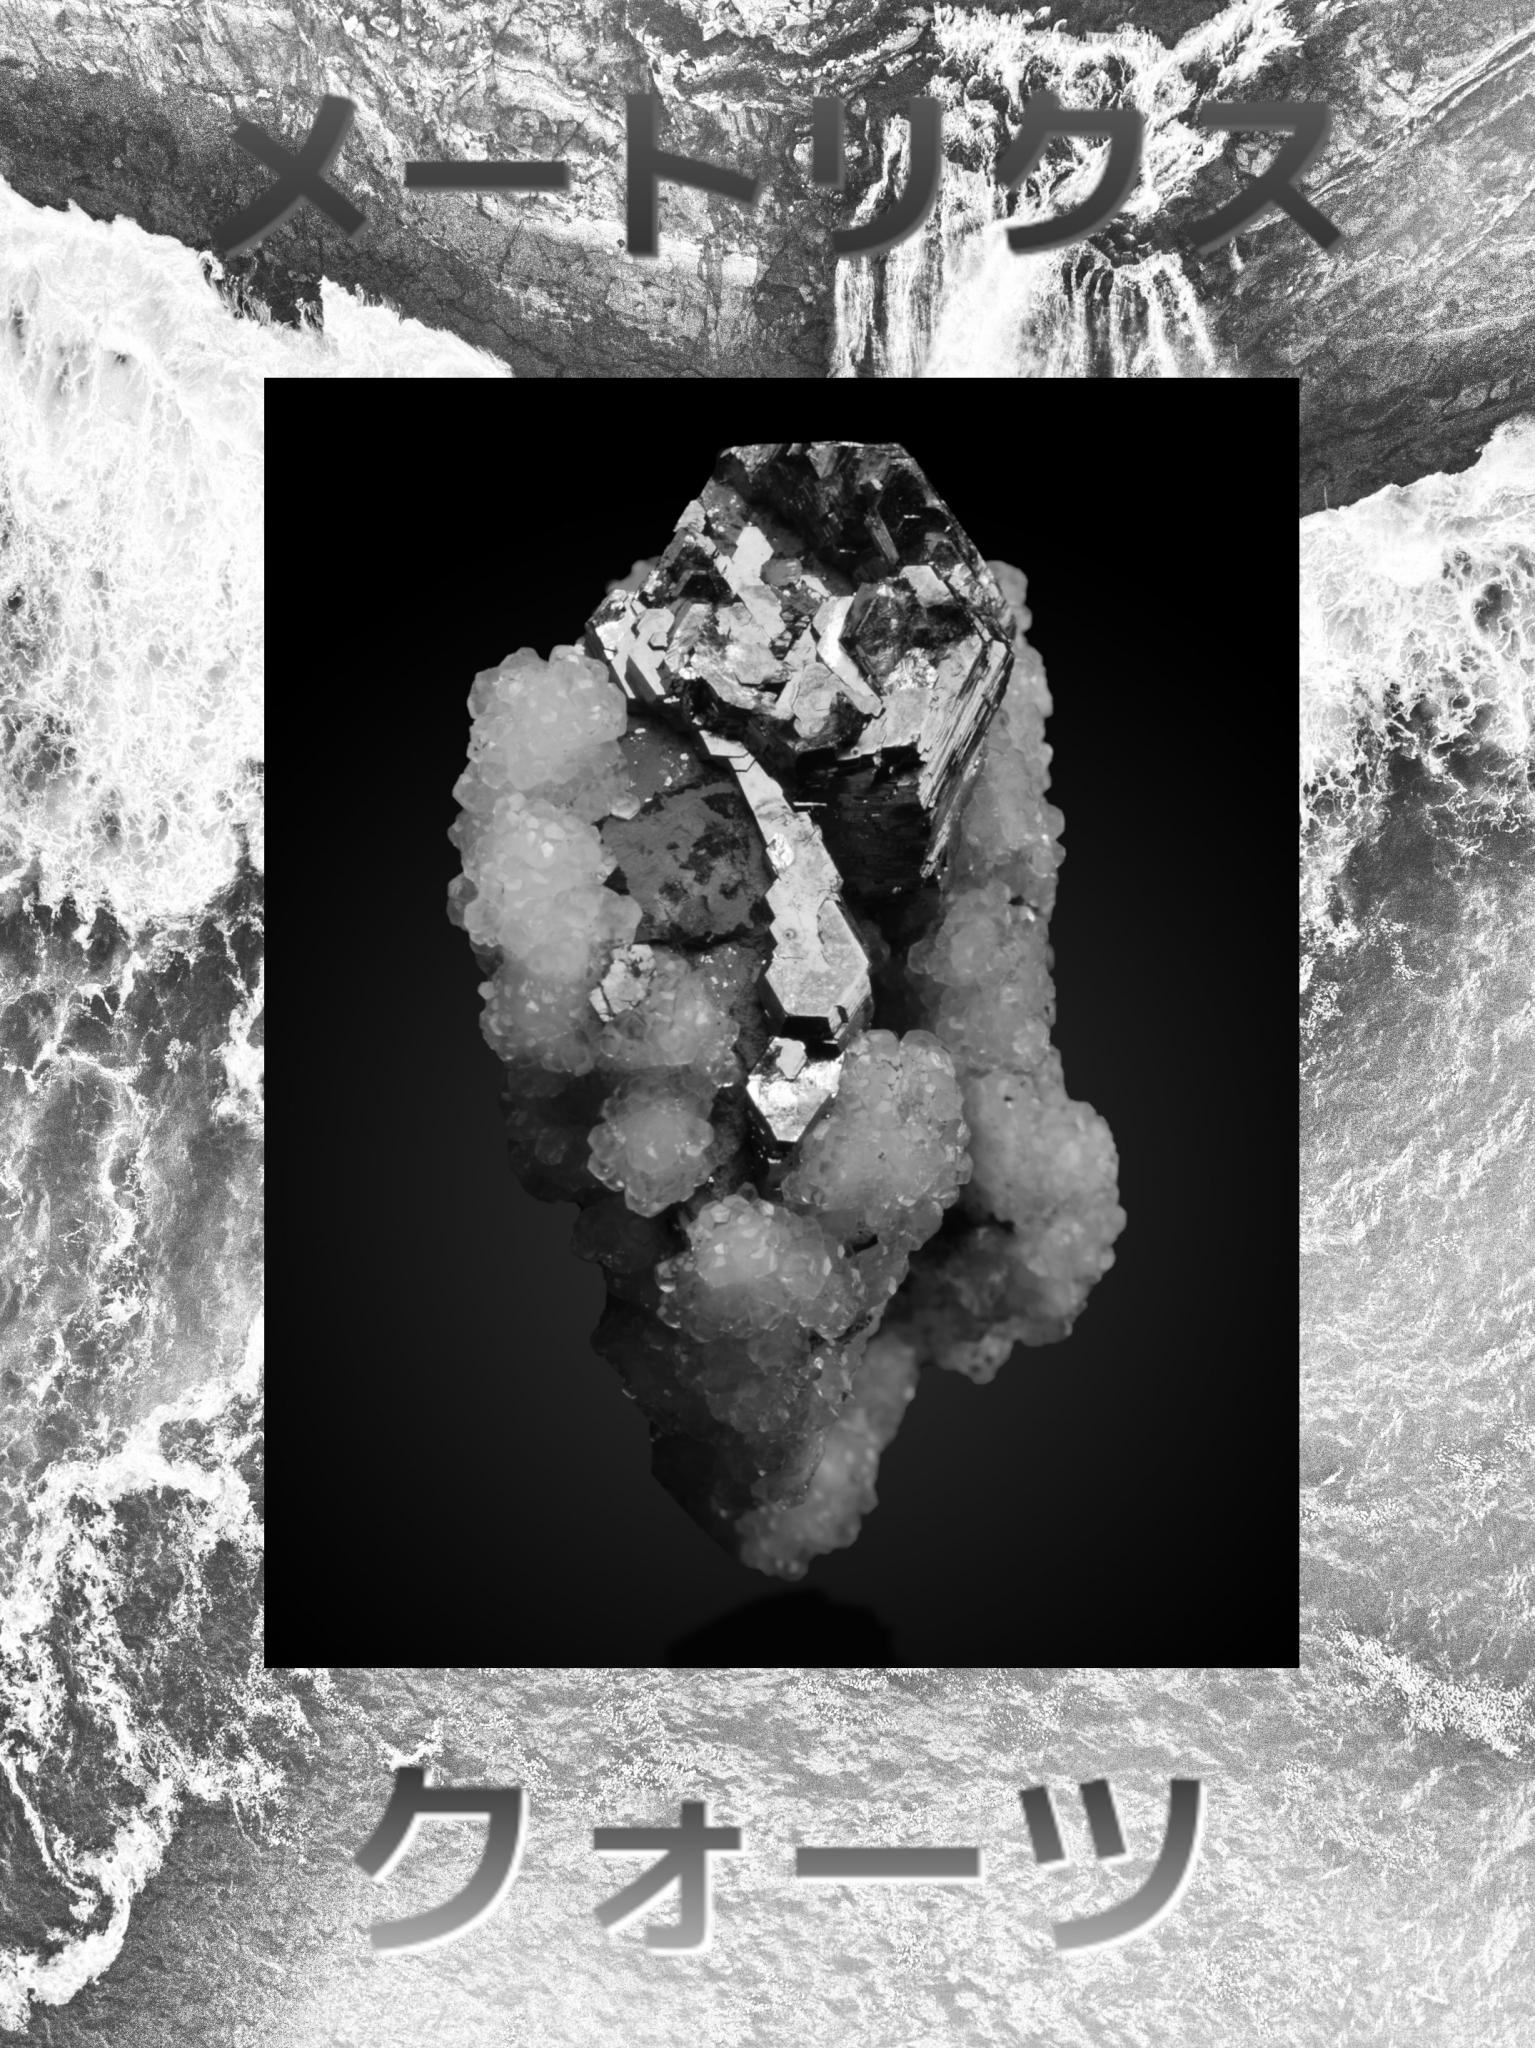 Moonstone Bloodstone 𝑏𝑦 Chris Moran